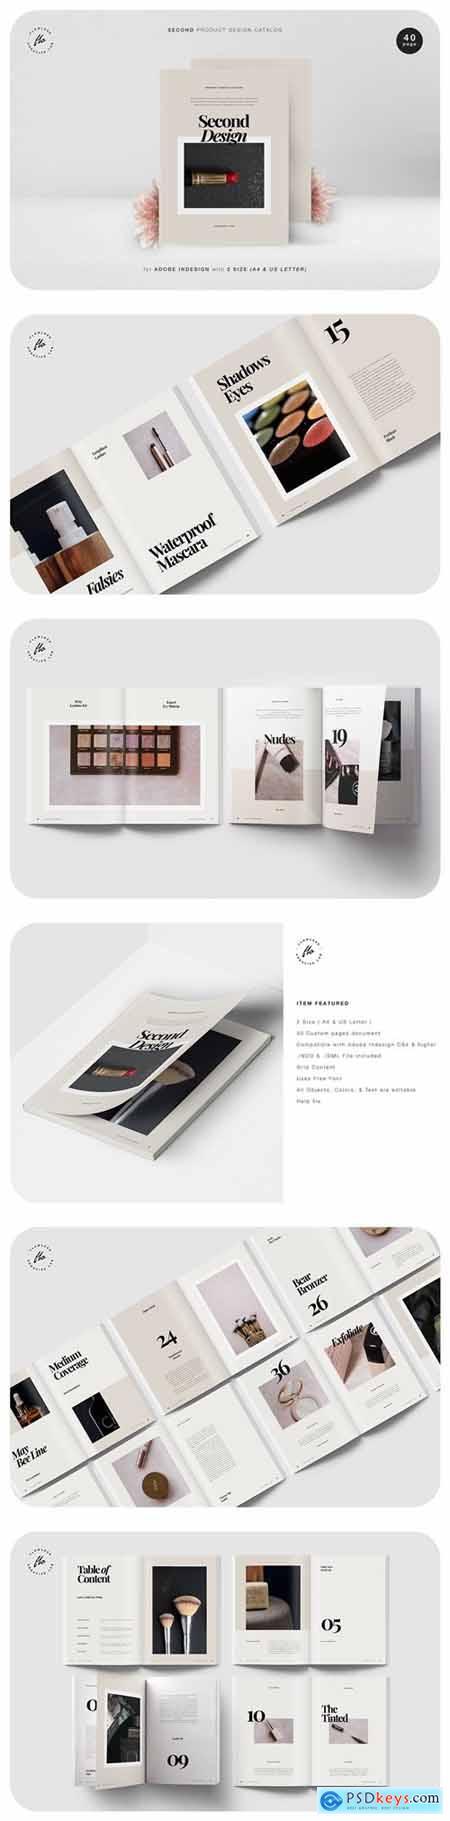 Second Product Design Catalog